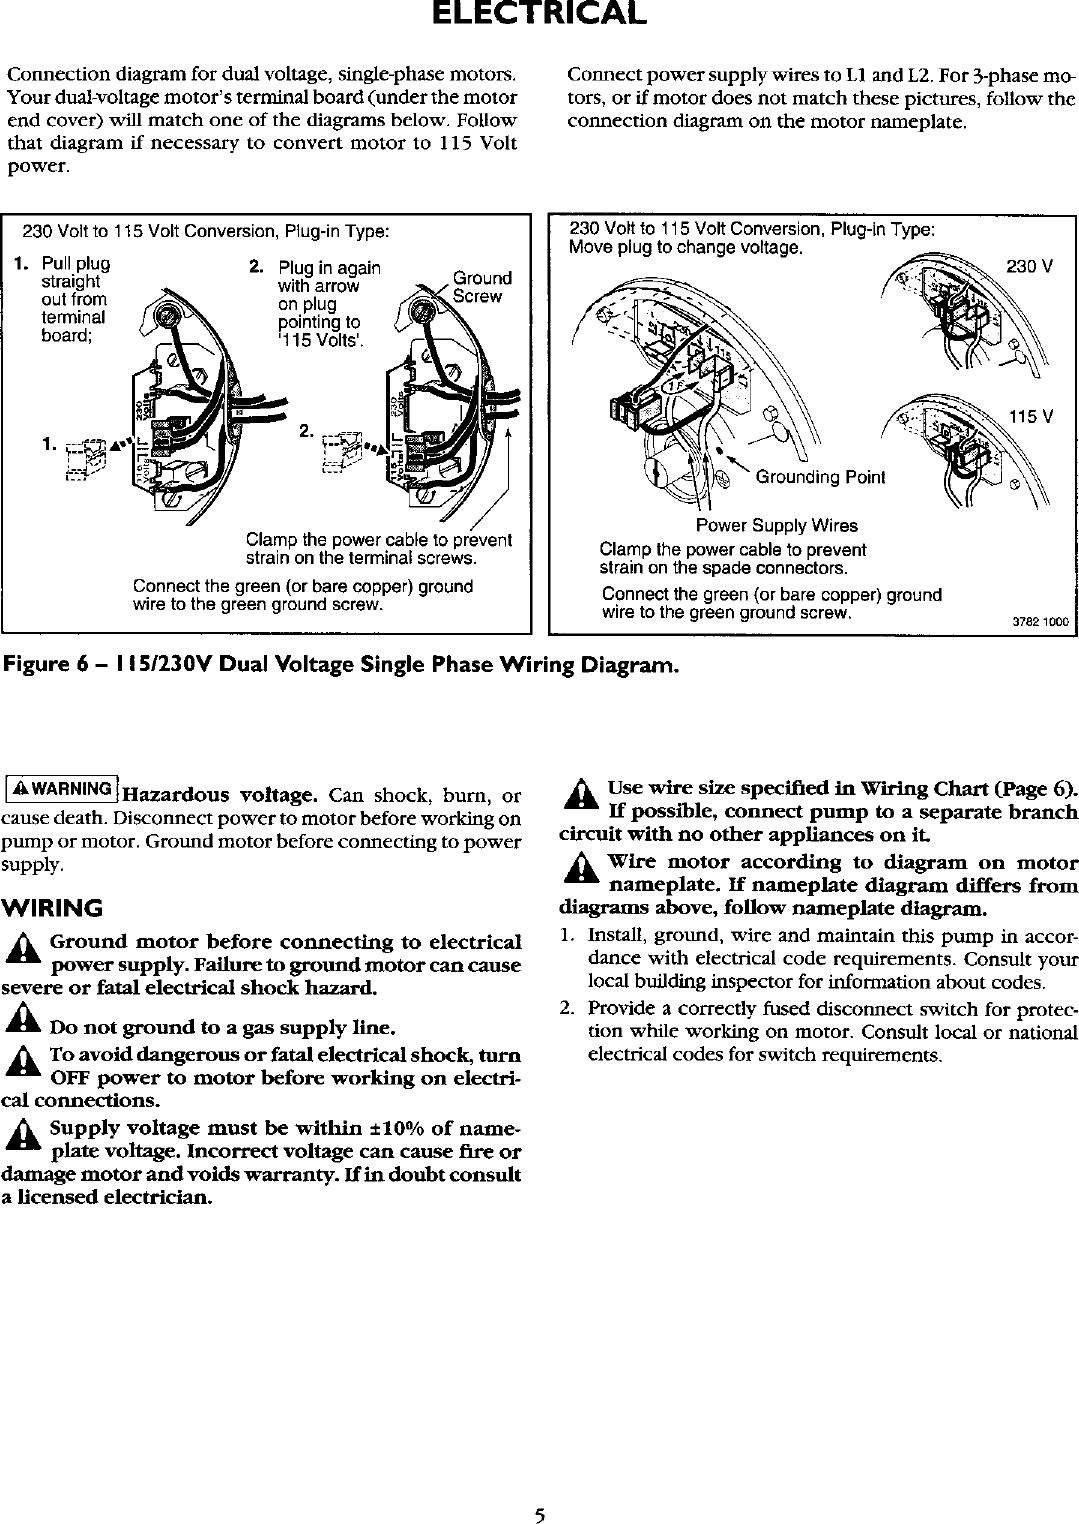 Diagram 115 Volt Motor Wiring Diagram Cw Full Version Hd Quality Diagram Cw Diagramdennyj Kazantip Fr